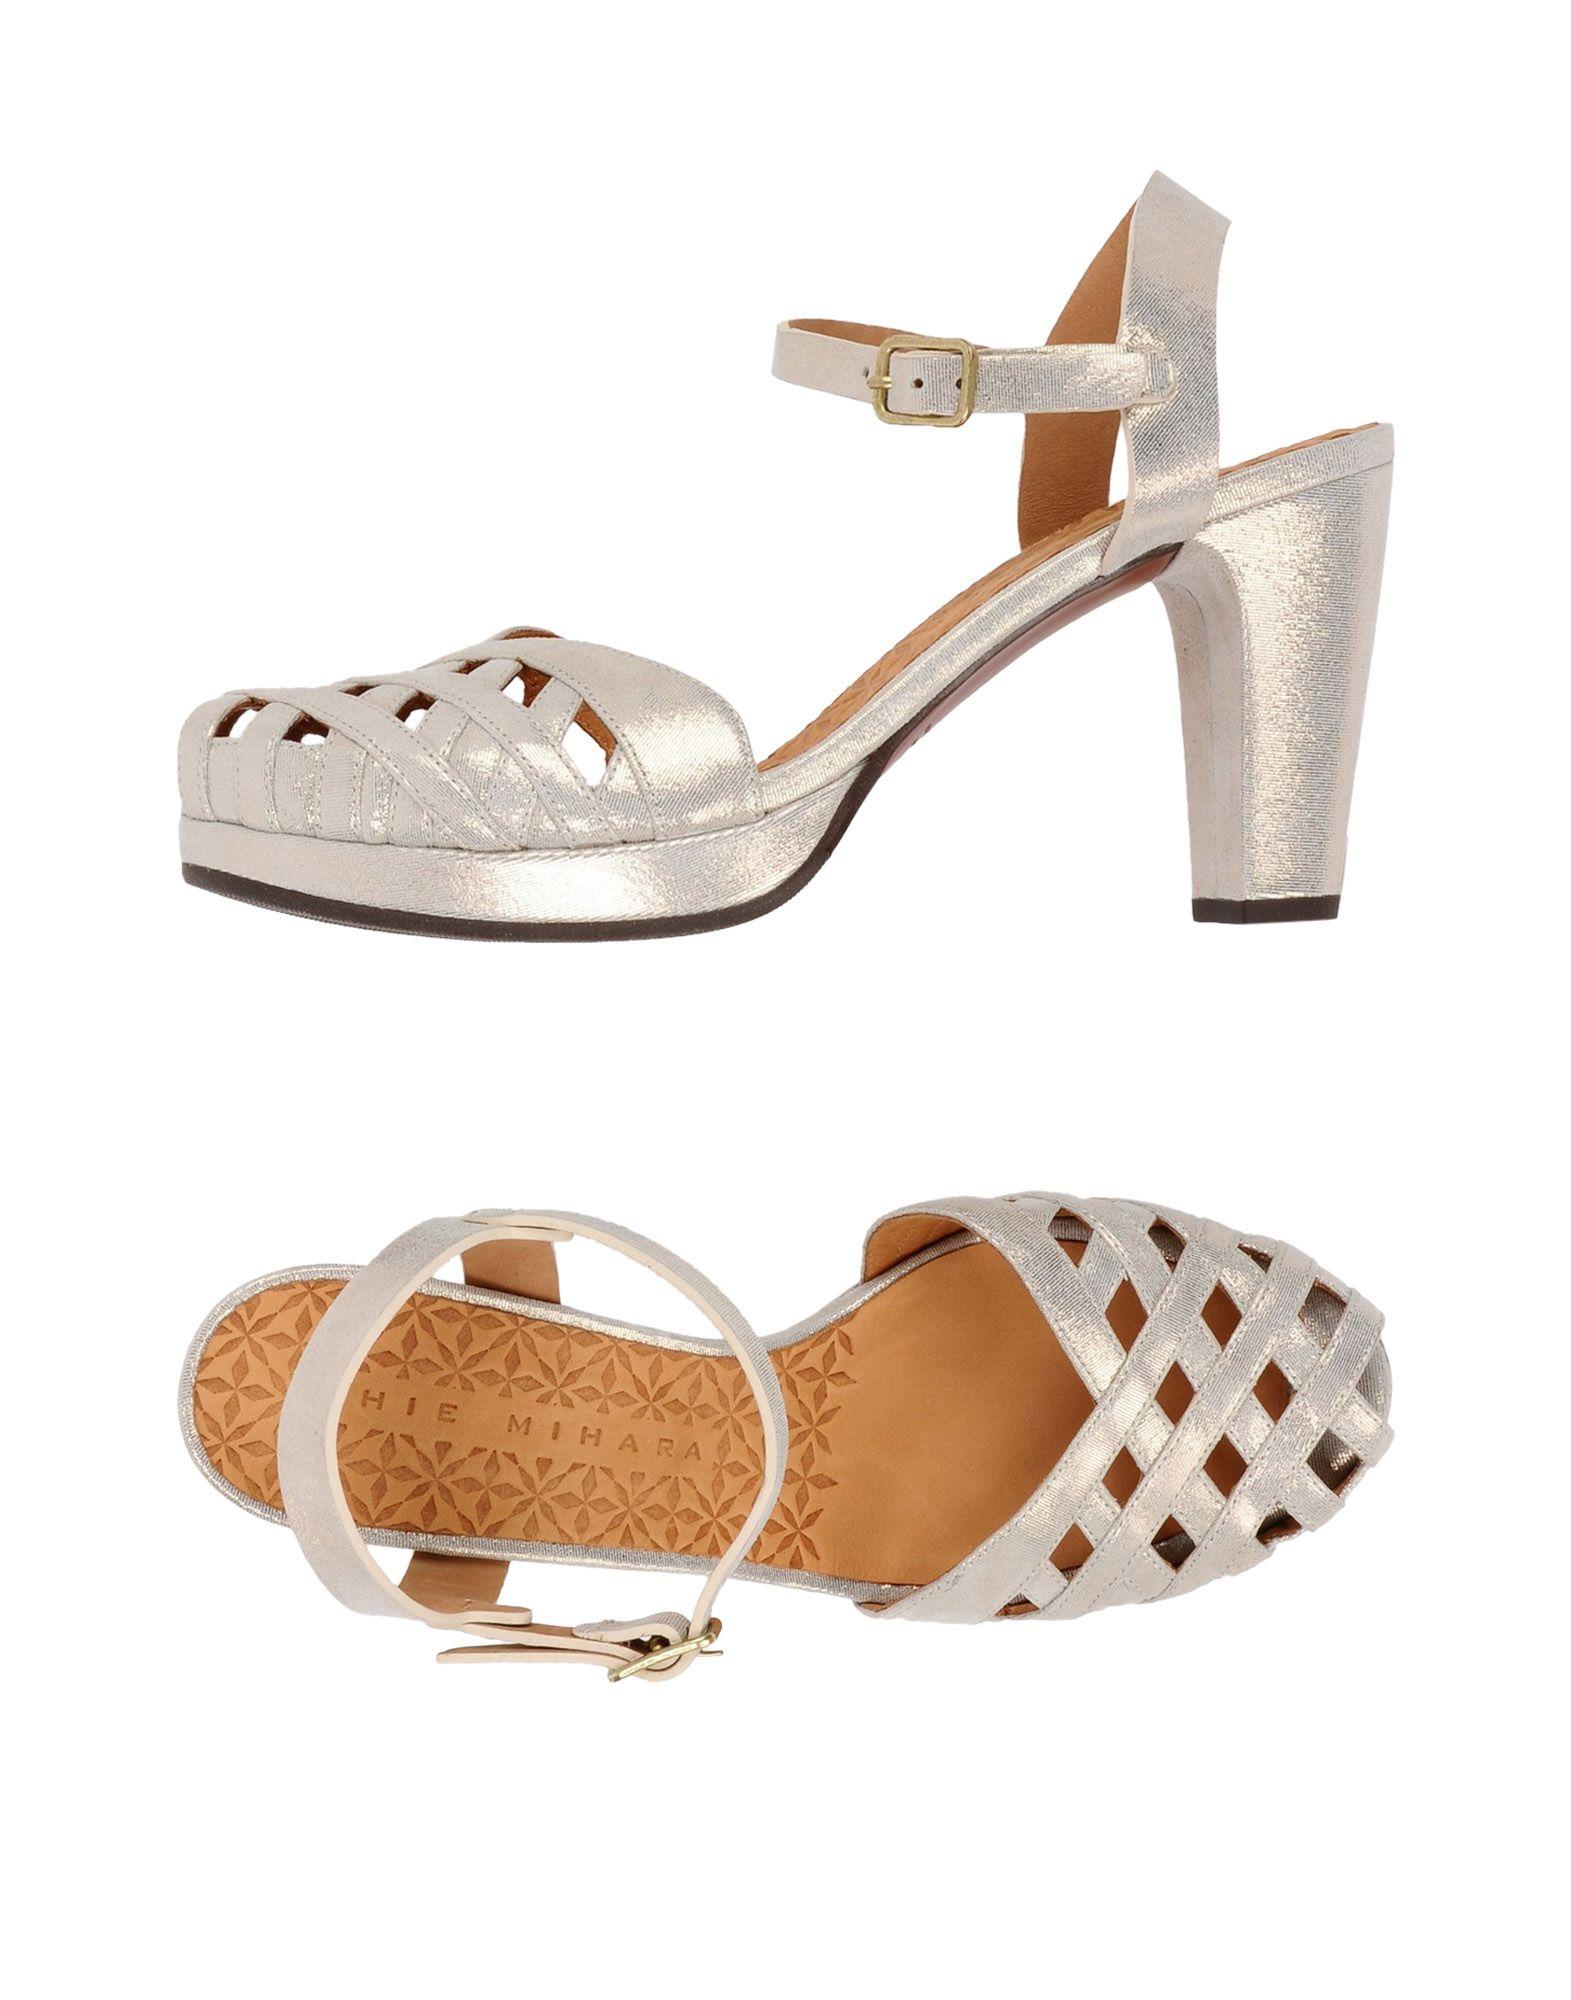 Sandales Chie Mihara Gaime32 - Femme - Sandales Chie Mihara sur